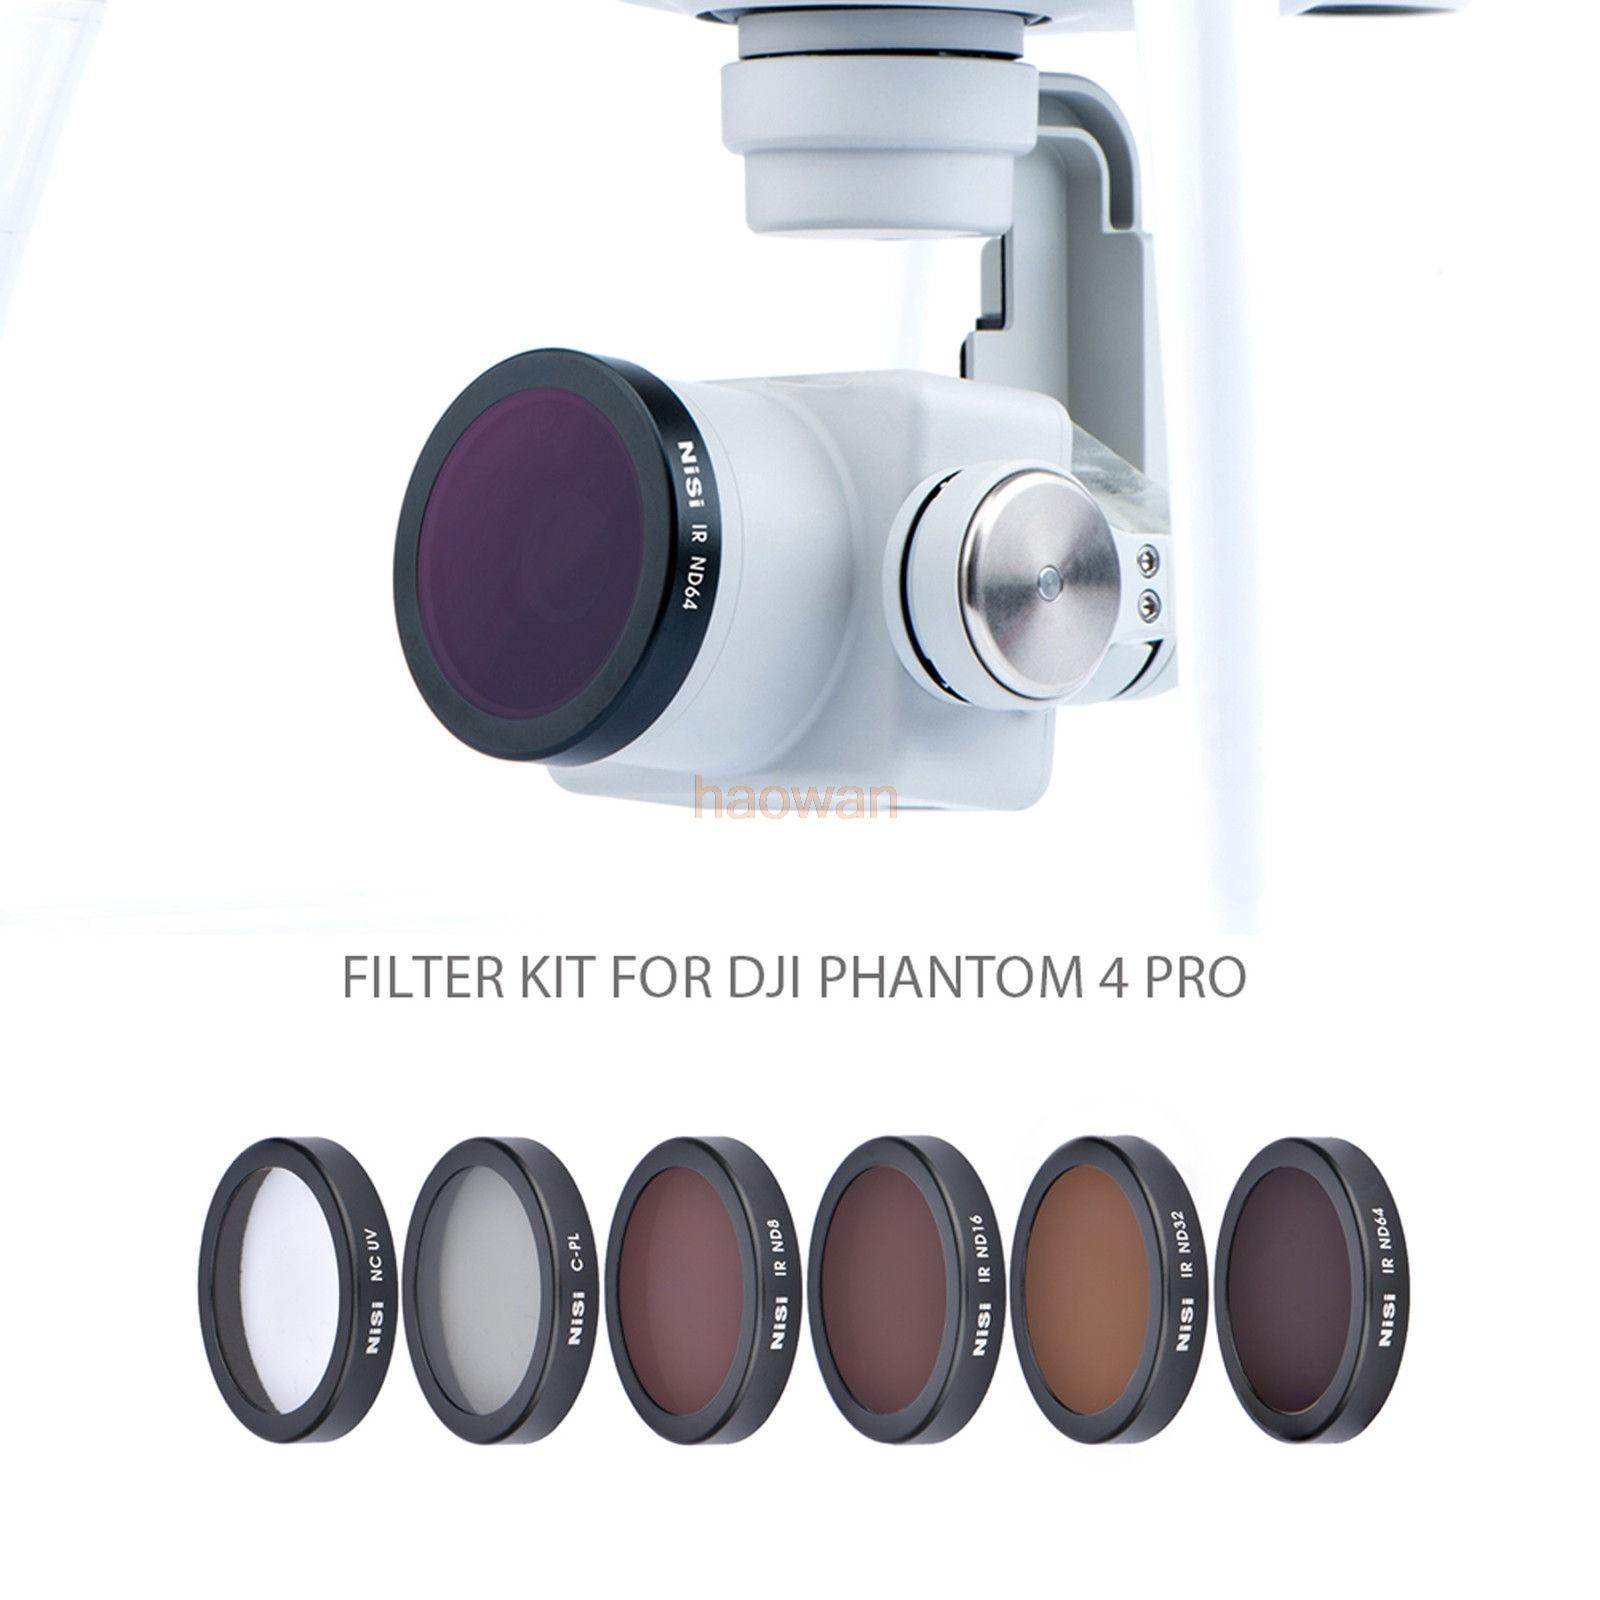 cpl+mcuv+nd8+nd16+nd32+nd64 nd Lens Filter Protector for DJI Phantom 4 Pro camera wtianya cpl mcuv nd4 nd8 nd neutral density lens filter protector for dji phantom 3 phantom 4 camera